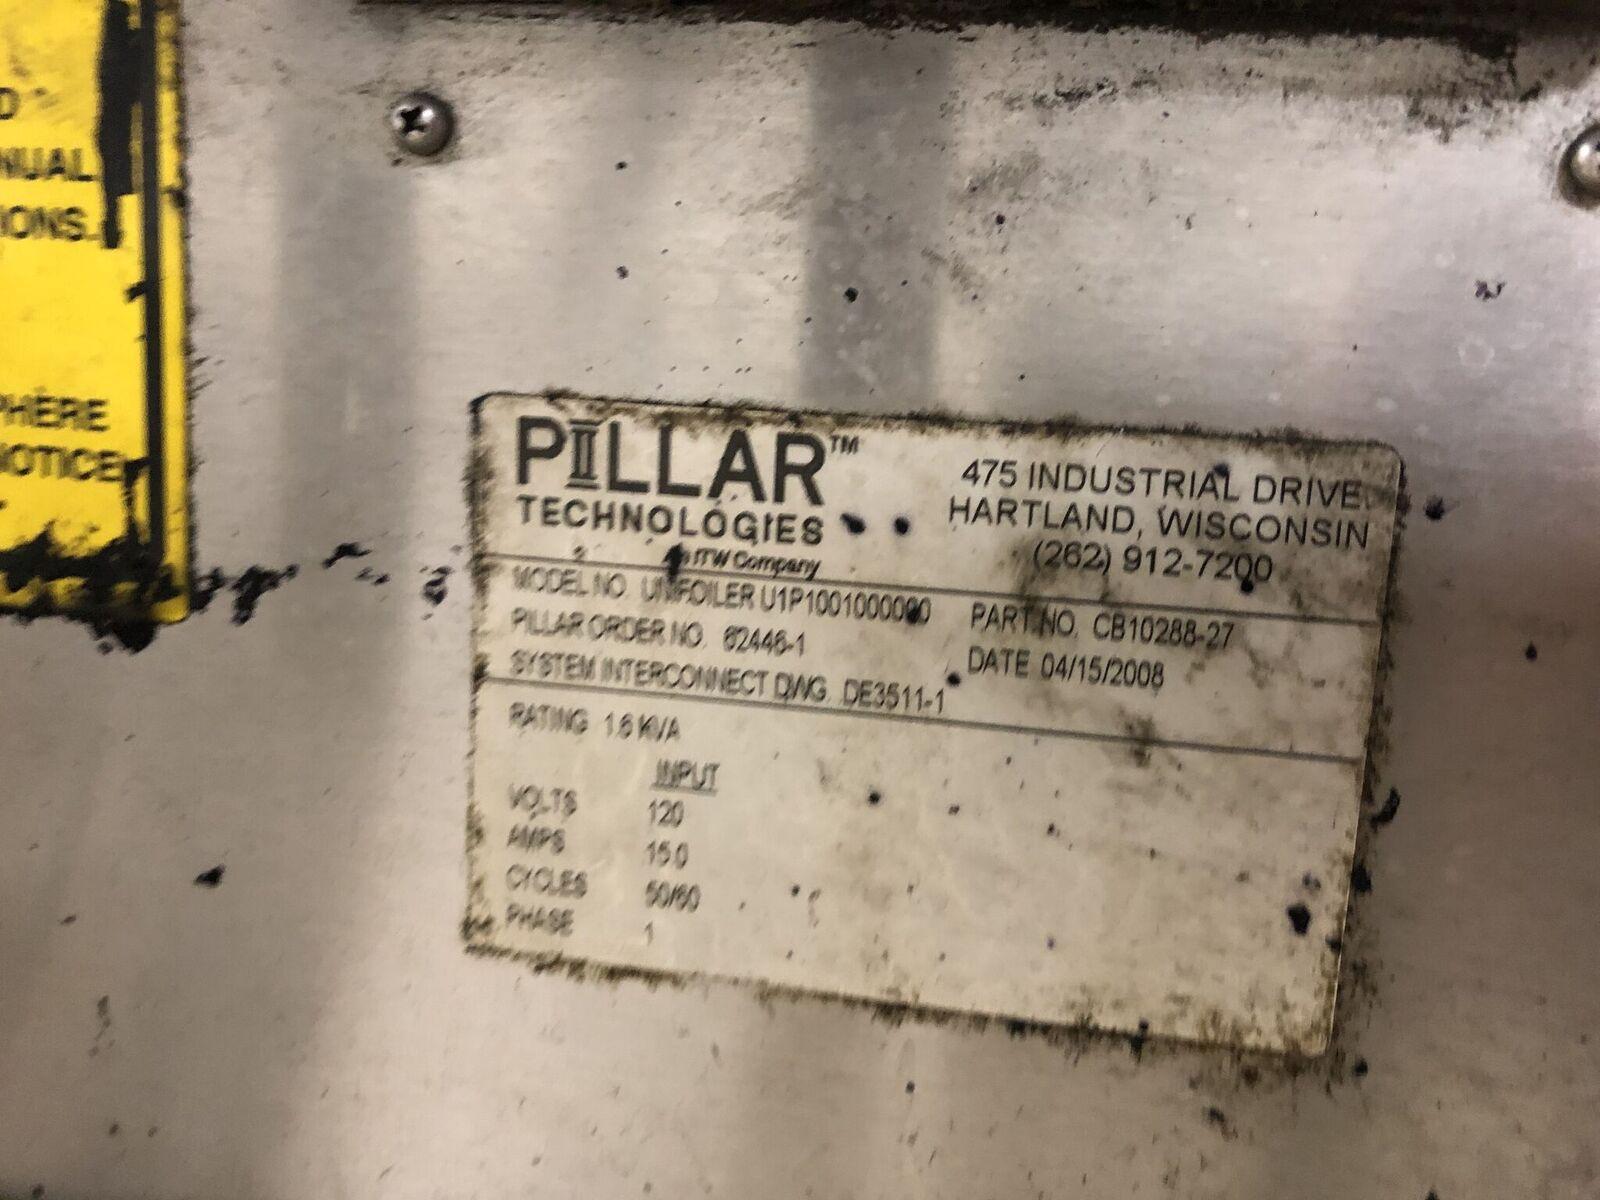 Pillar Technologies Unifoiler Cap Sealing Machine, Model #U1P1001000000, DOM April 2009 - Image 7 of 7